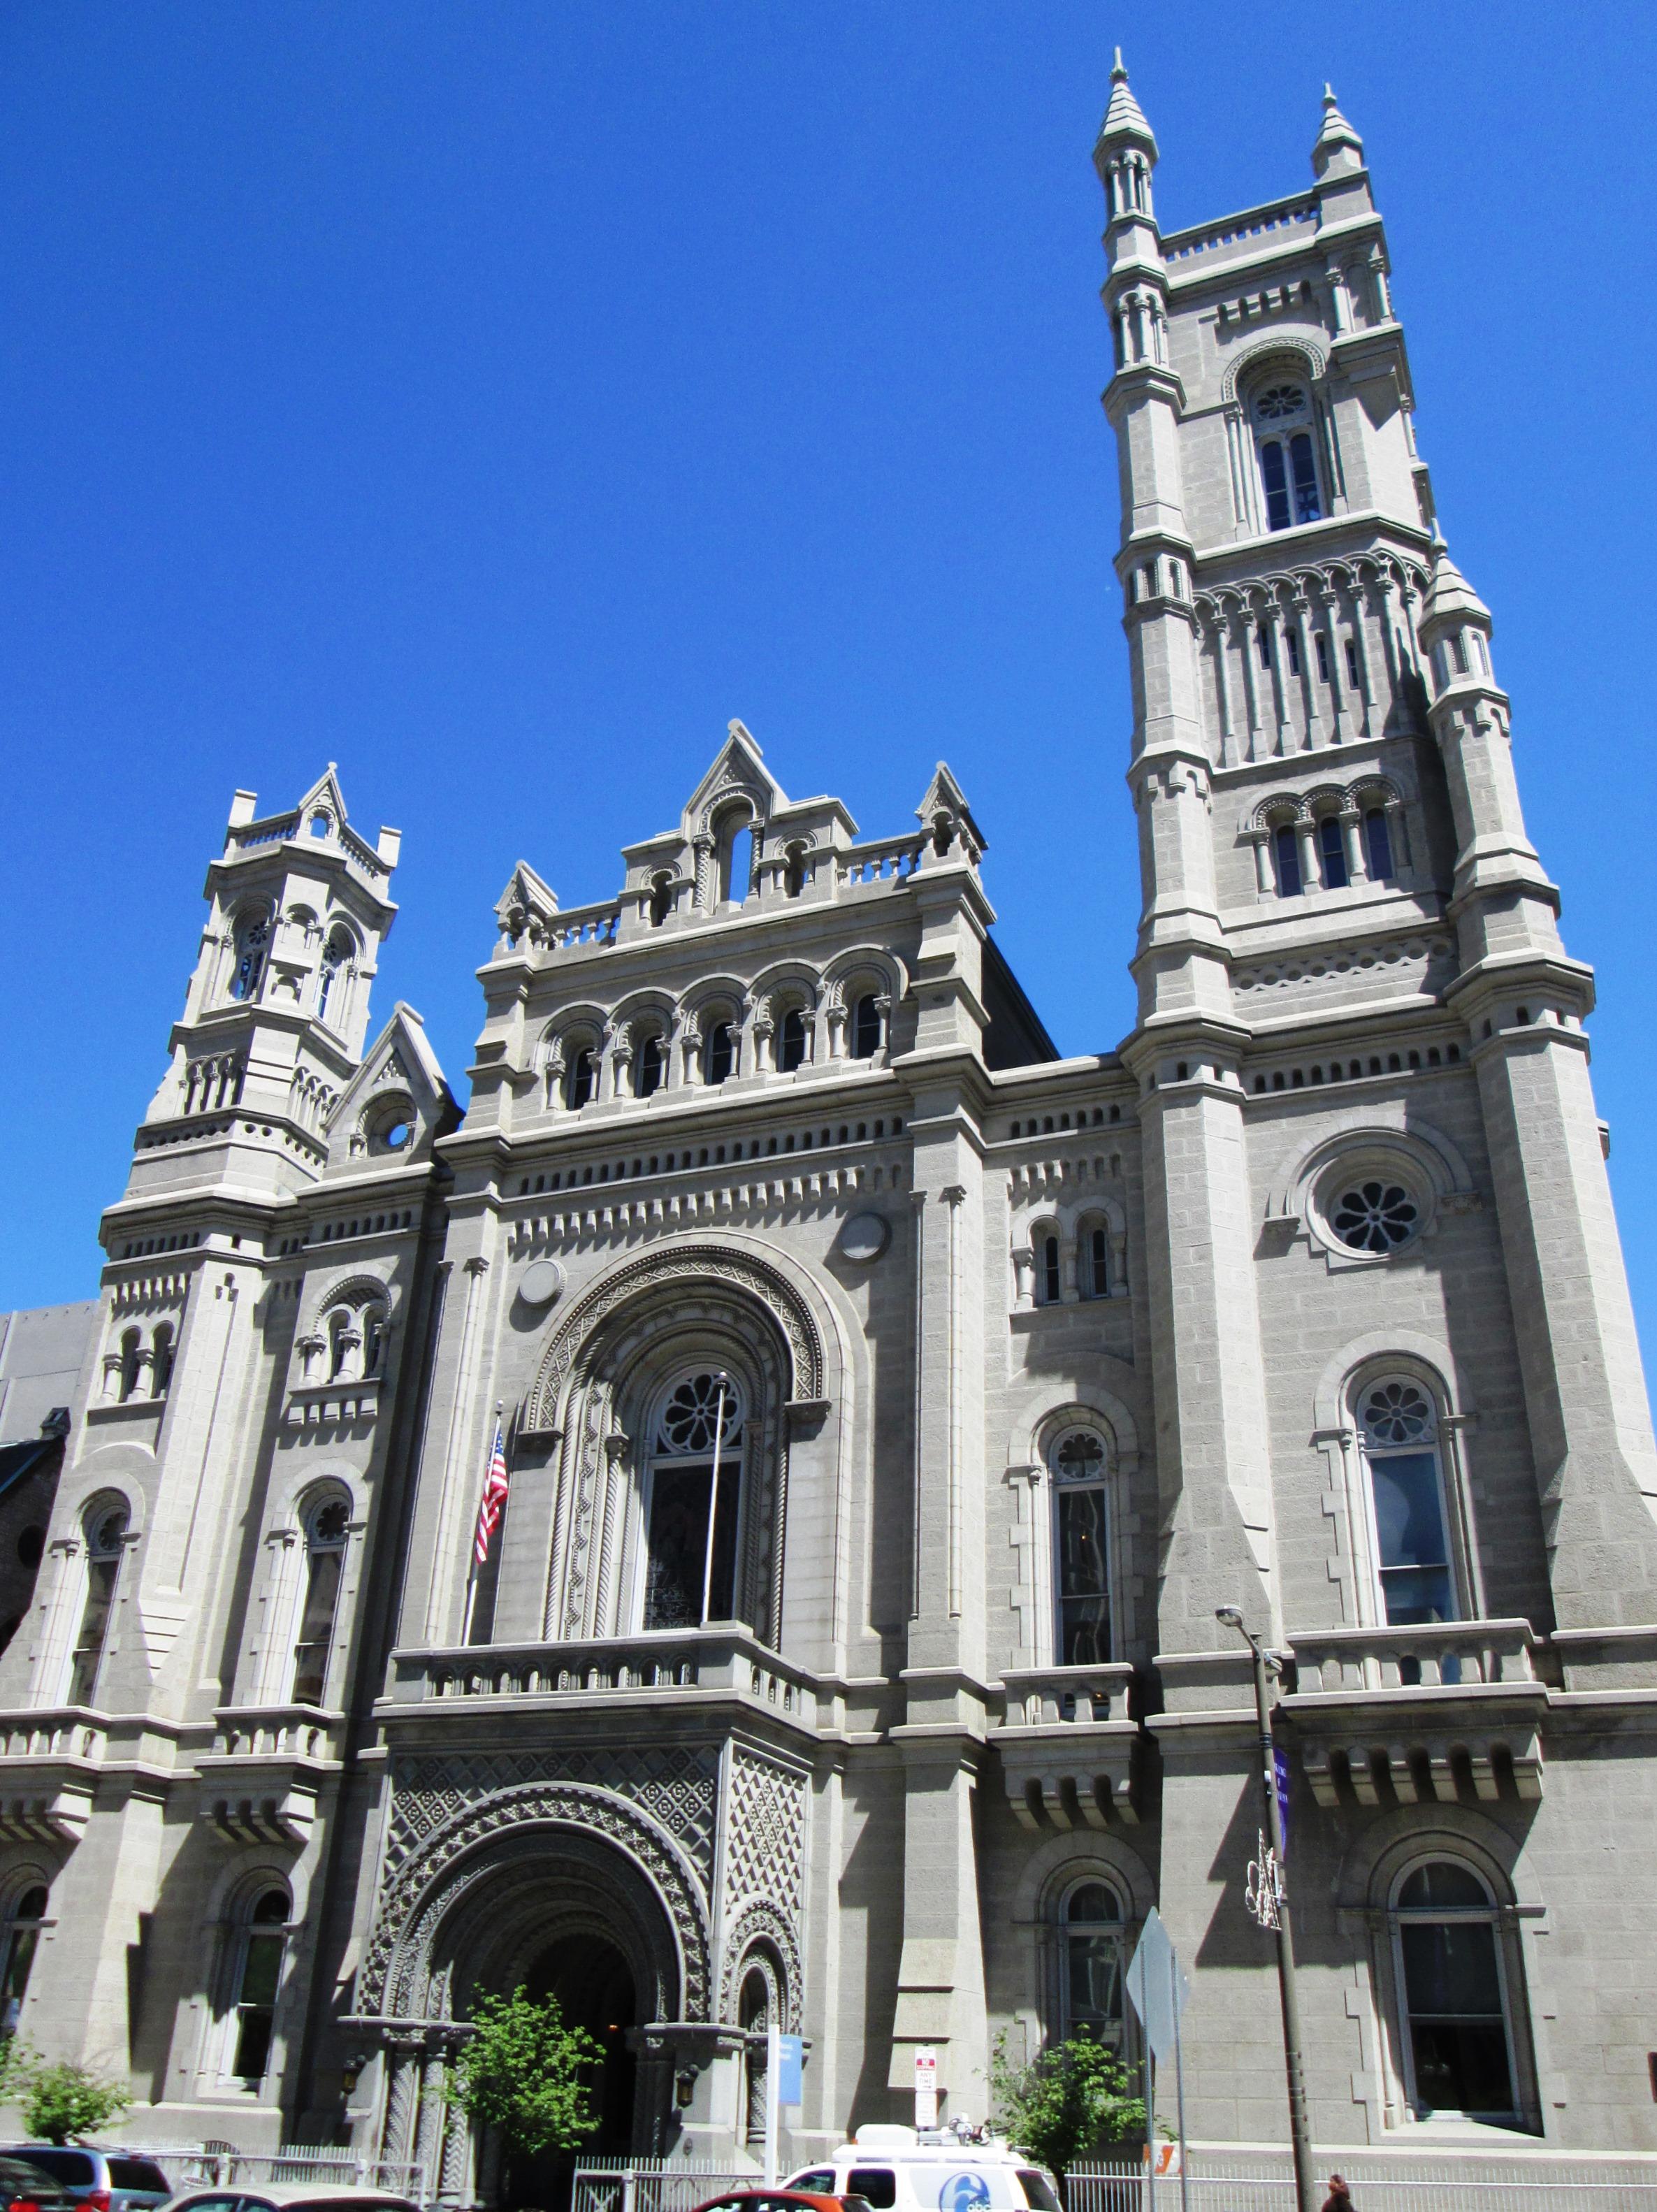 History of the Philadelphia Masonic Temple Masonic_Temple_Philadelphia_front_facade